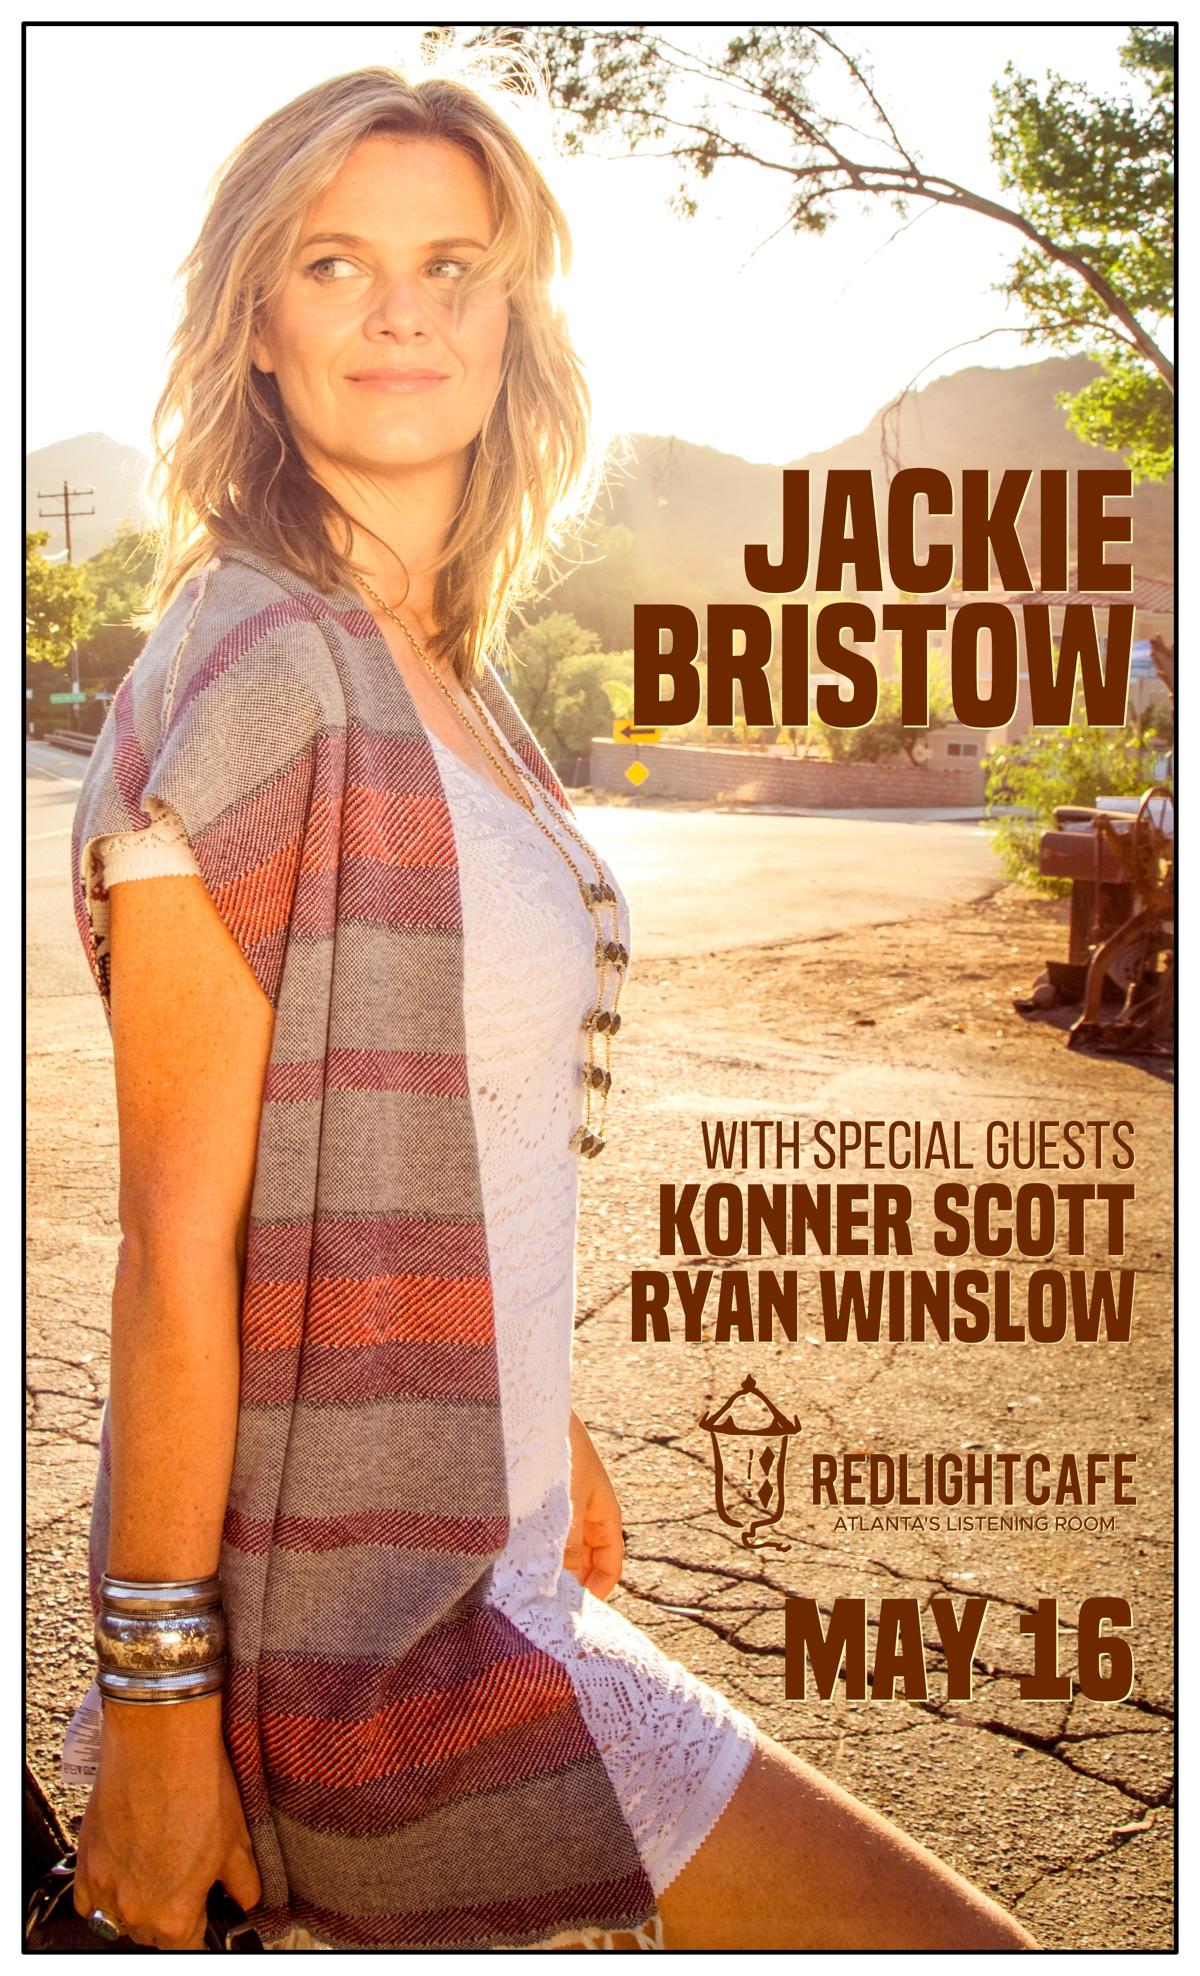 Jackie Bristow w/ Konner Scott + Ryan Winslow — May 16, 2019 — Red Light Café, Atlanta, GA